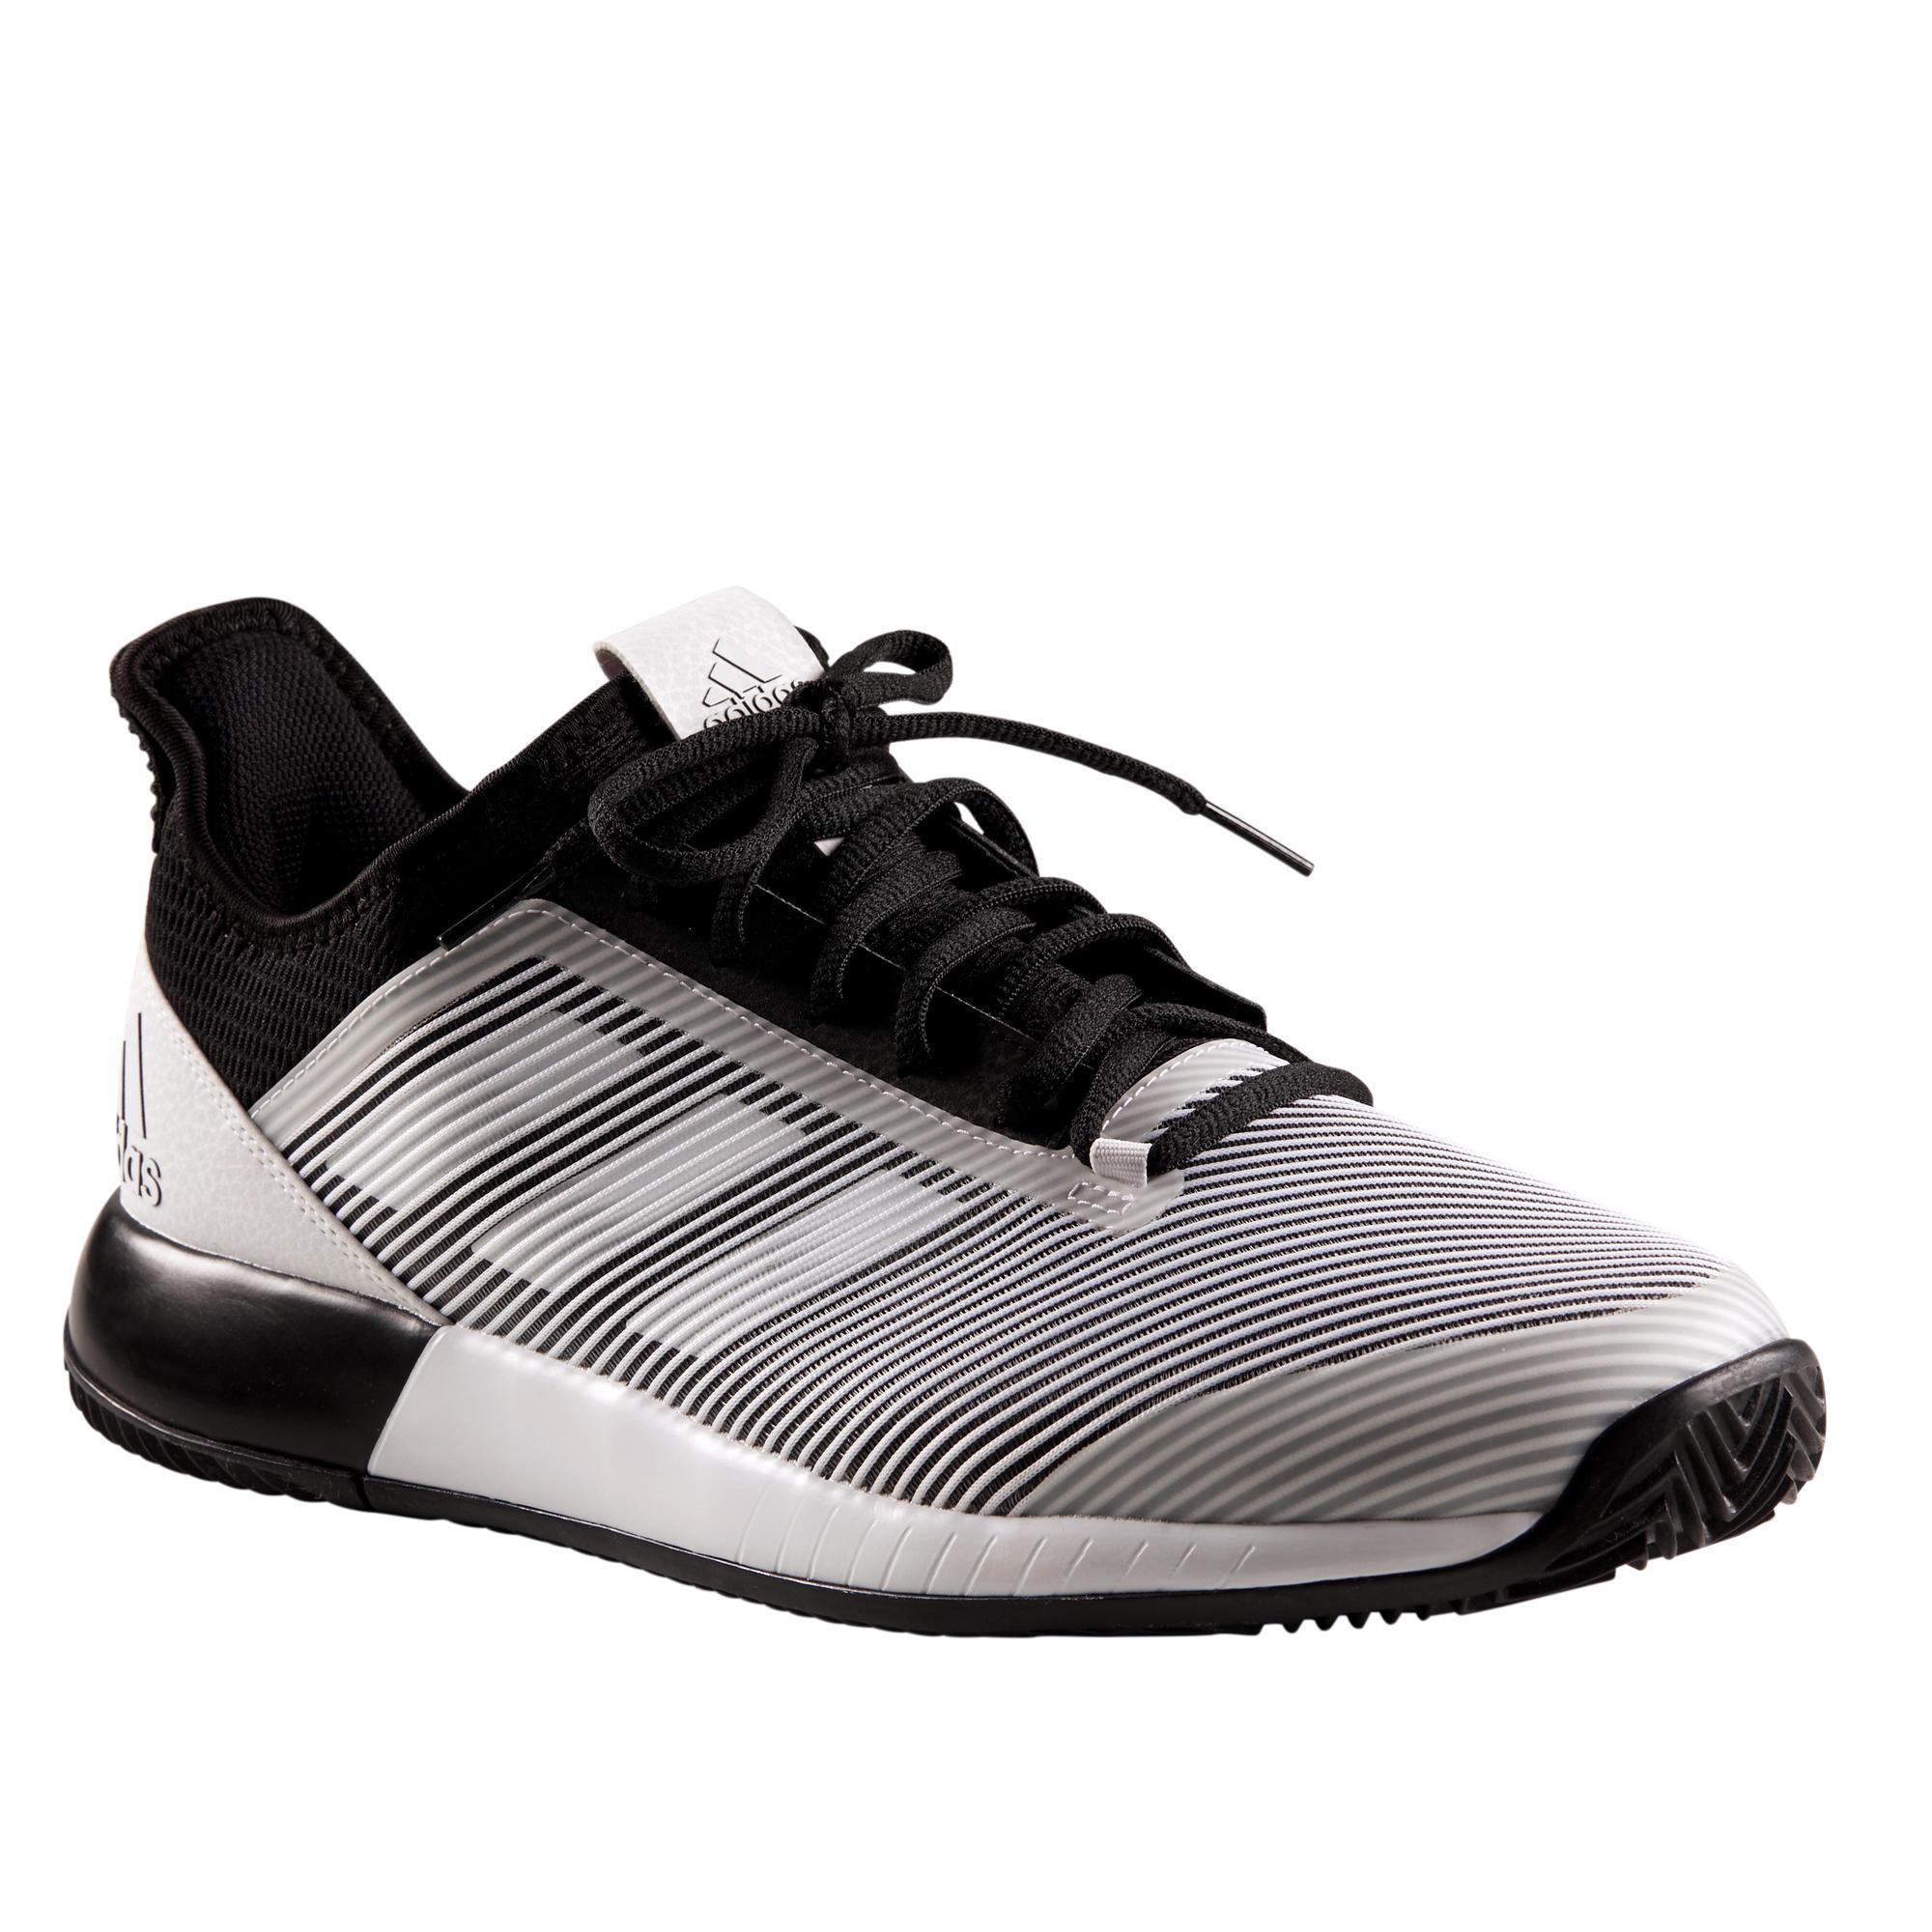 Adidas CHAUSSURE DE TENNIS HOMME ADIDAS DEFIANT MULTI COURT